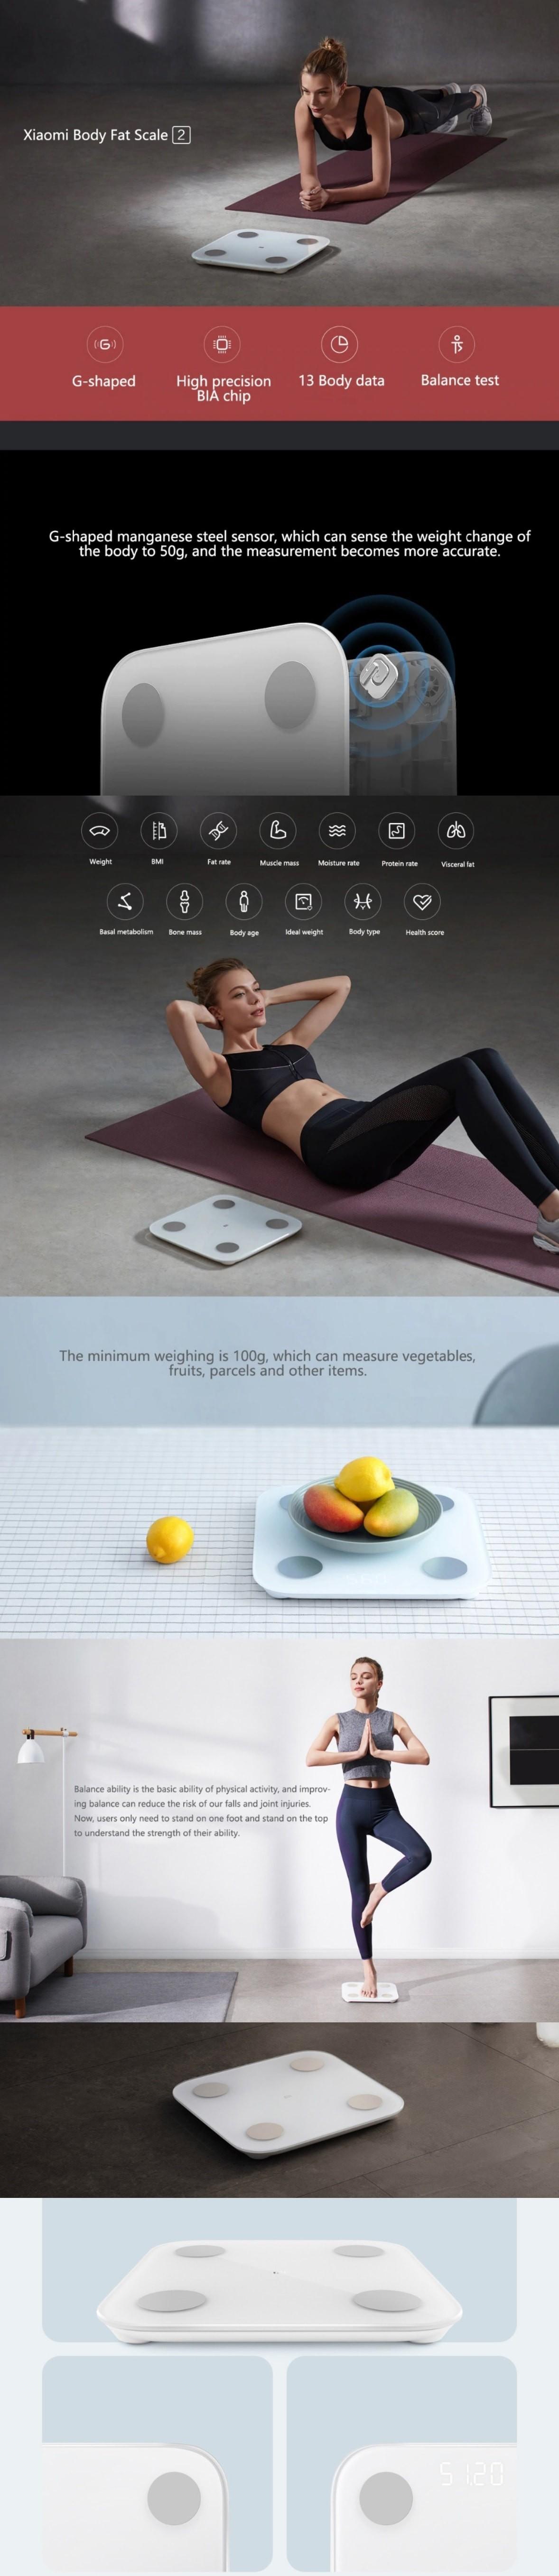 Prezentare-Xiaomi-Mi-Body-Composition-Scale-242af622f4bc55a9d.jpg